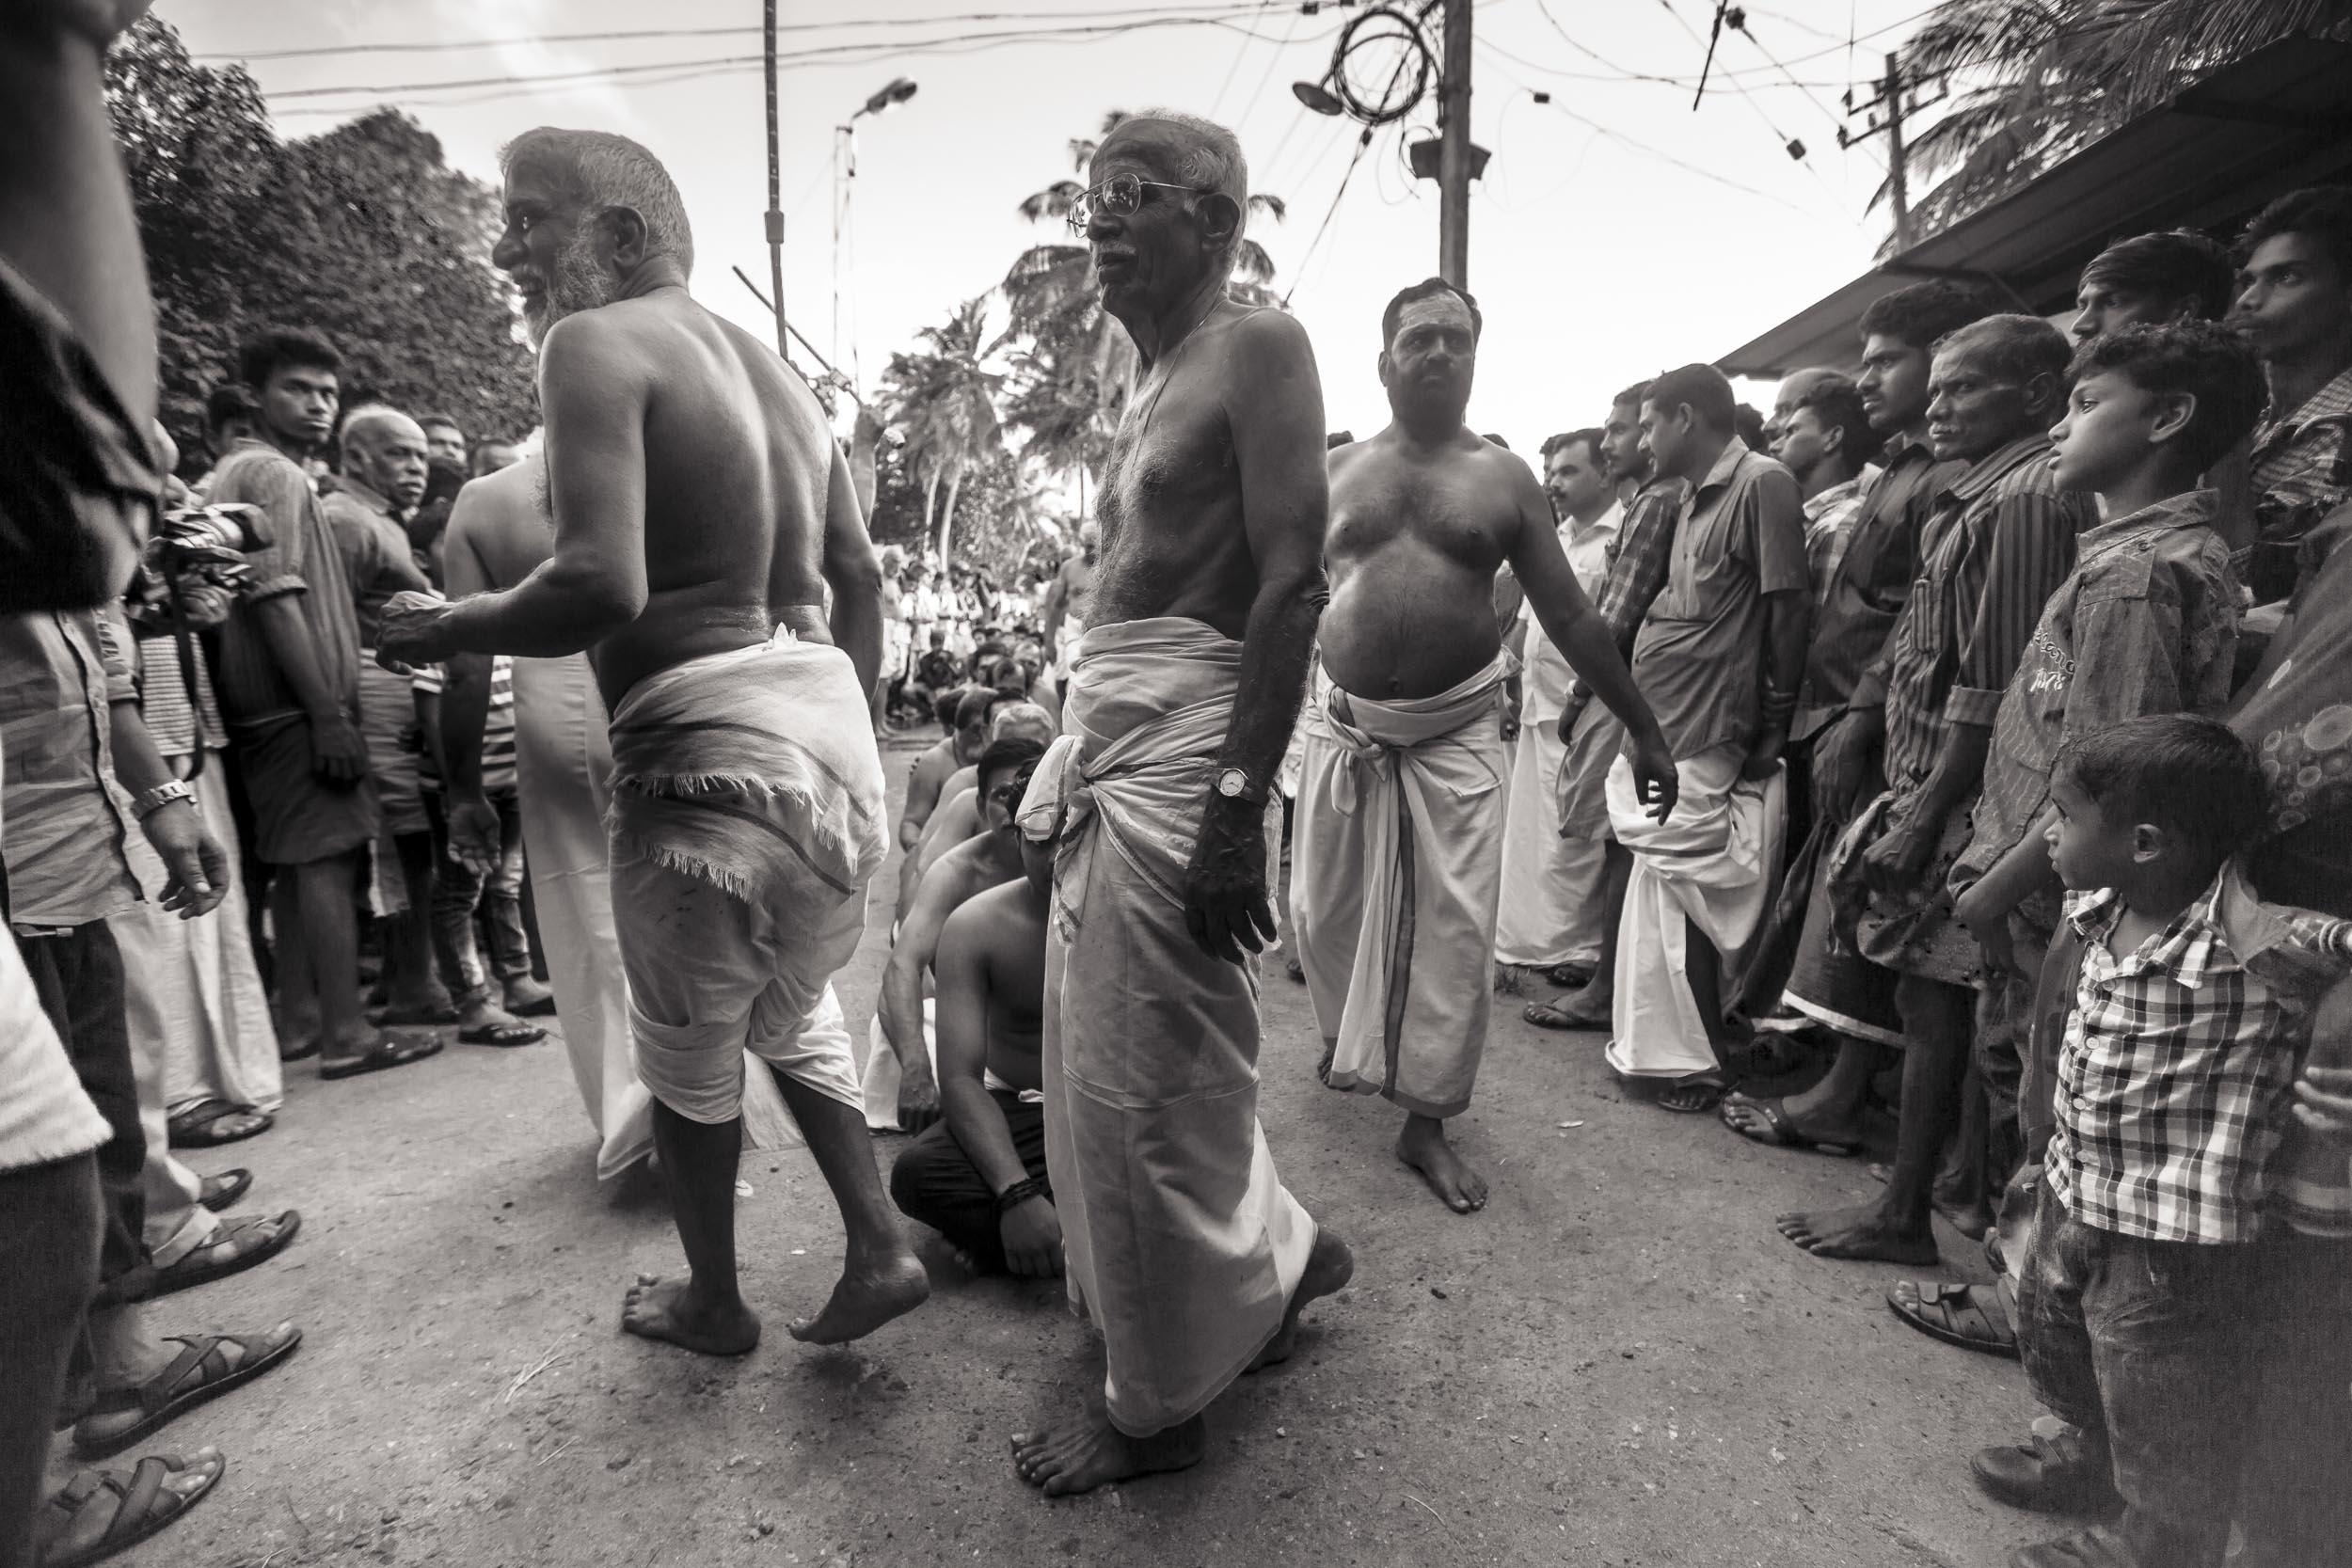 Sindhur_Photography_Travel_People_Kerala-44.JPG